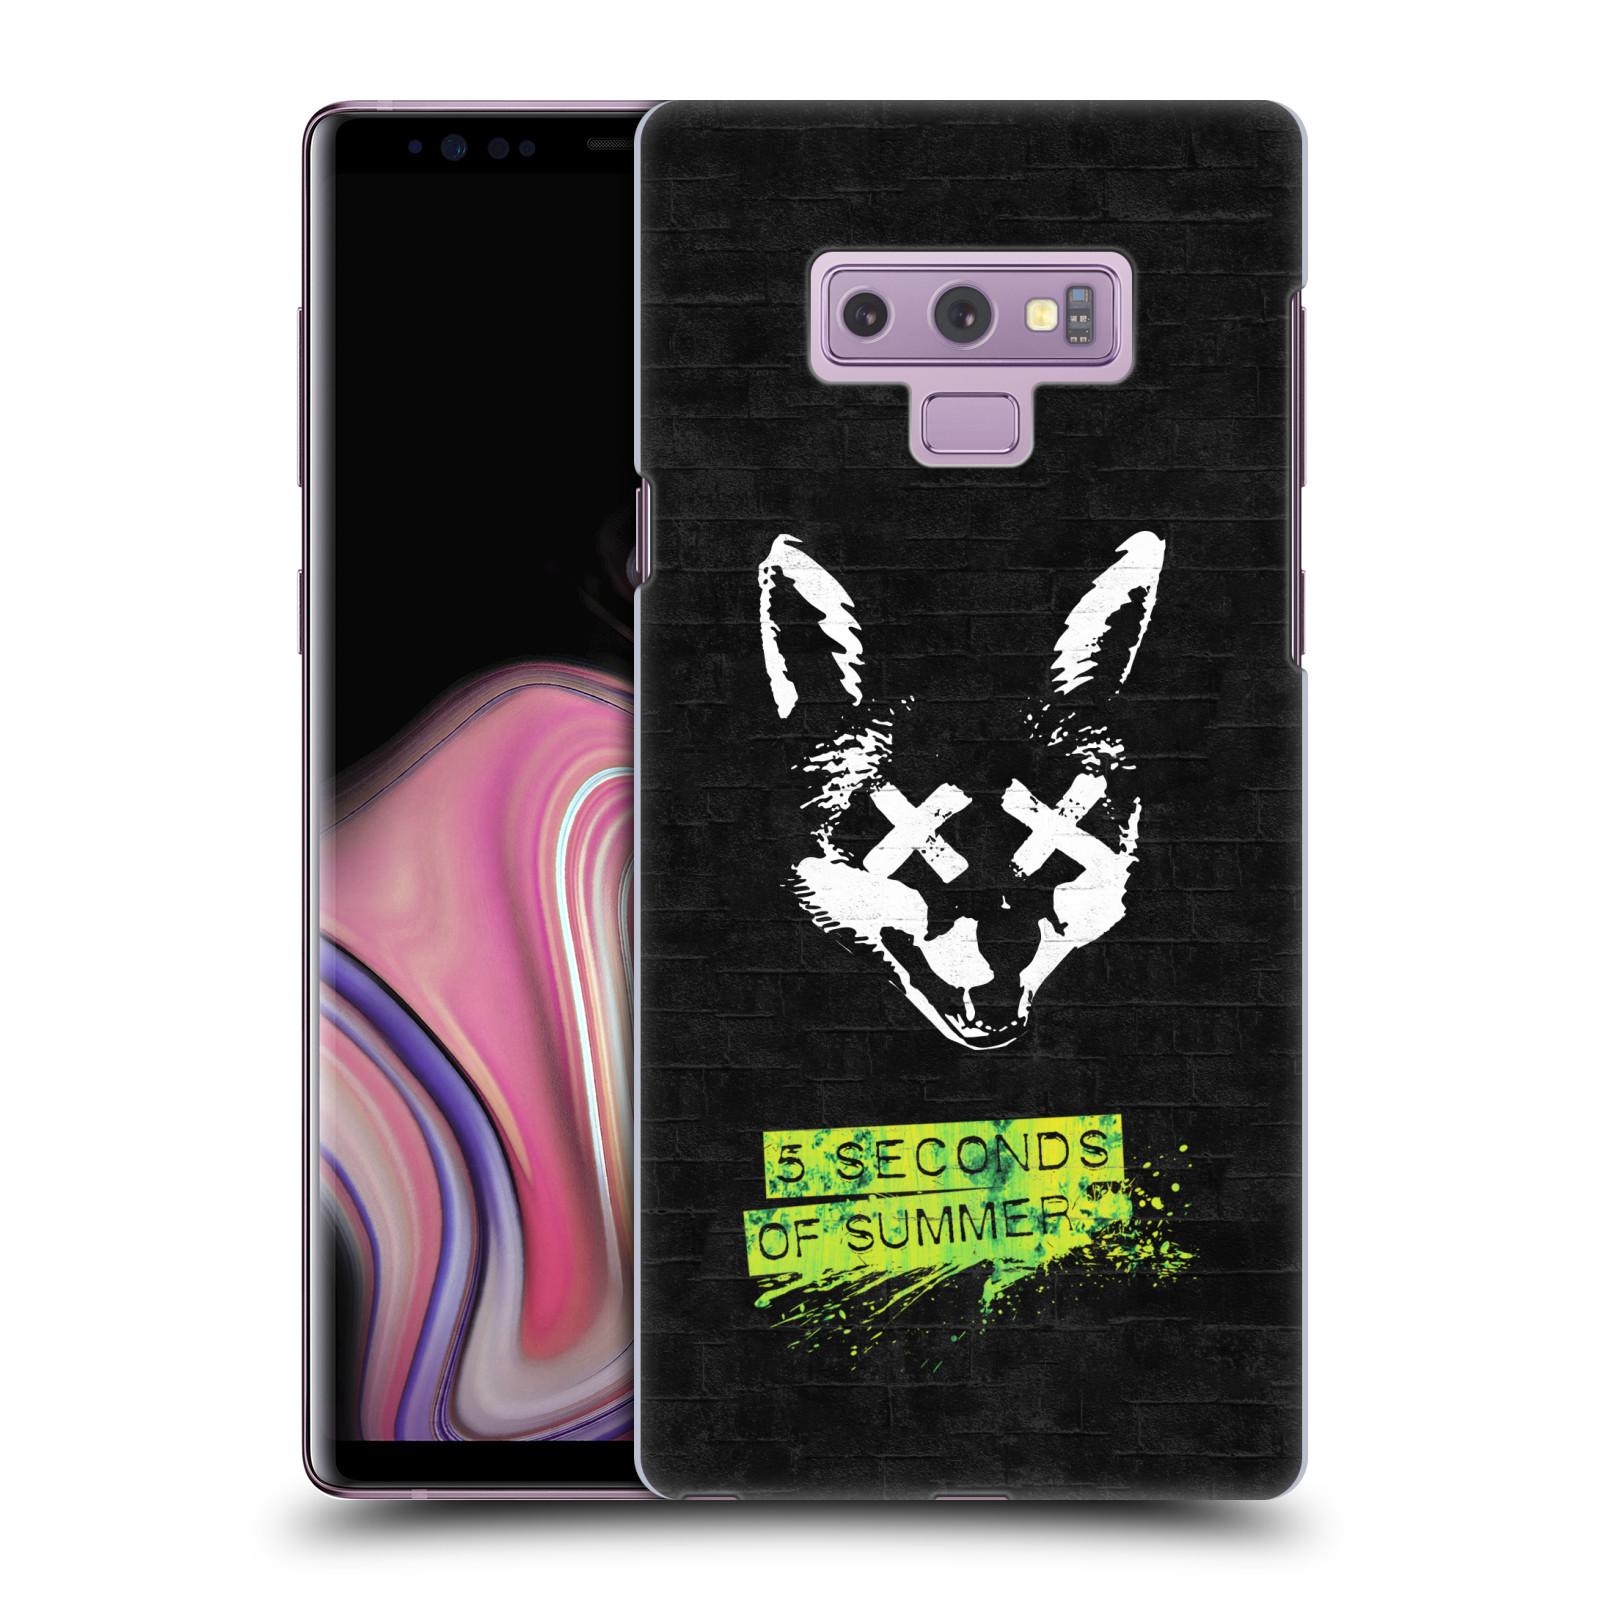 Plastové pouzdro na mobil Samsung Galaxy Note 9 - Head Case - 5 Seconds of Summer - Fox